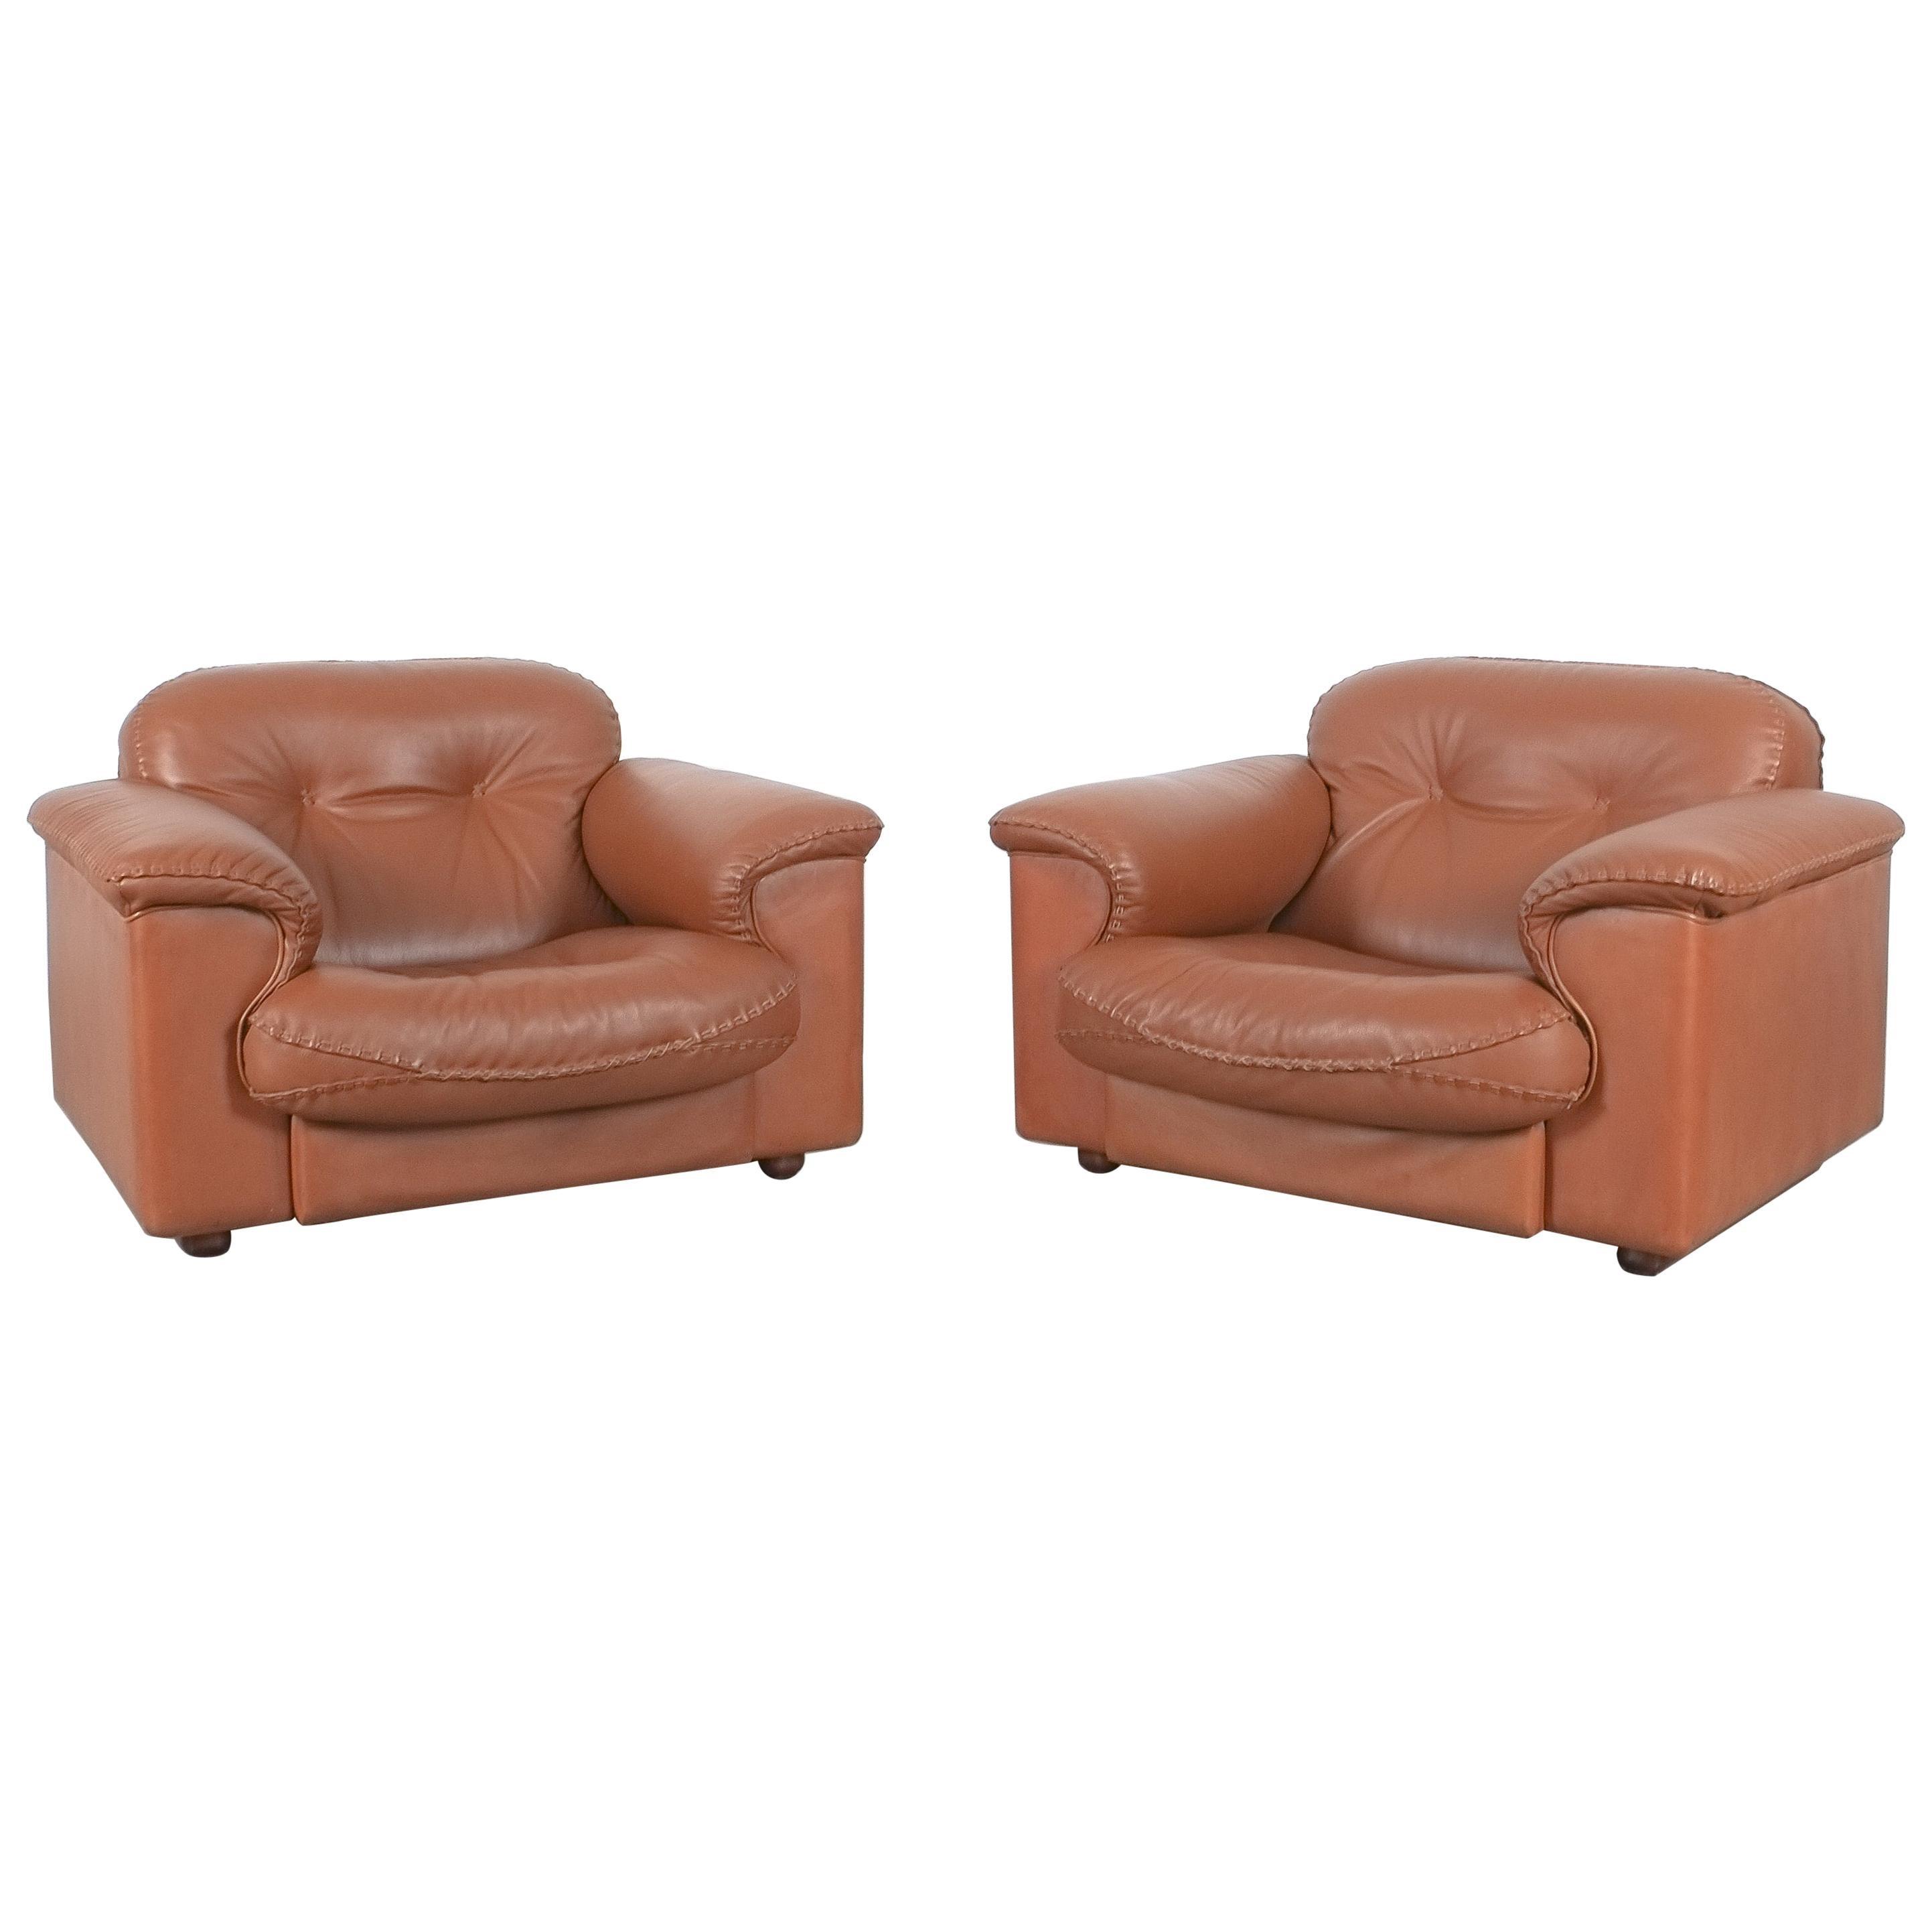 De Sede Reclining Leather Lounge Armchair Pair DS 101, 1969